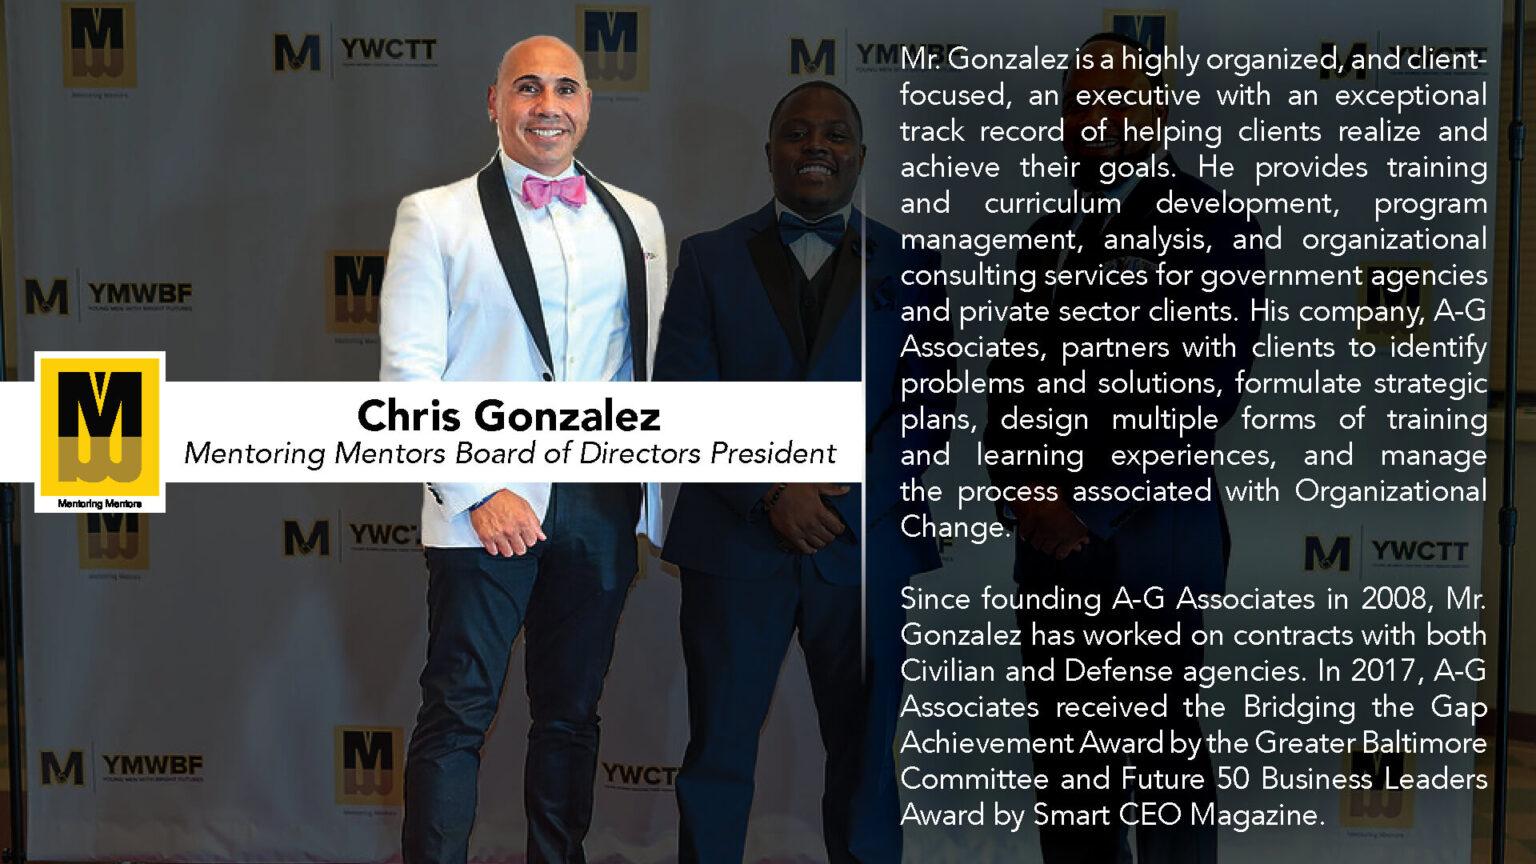 Mentoring Mentors Board of Directors President